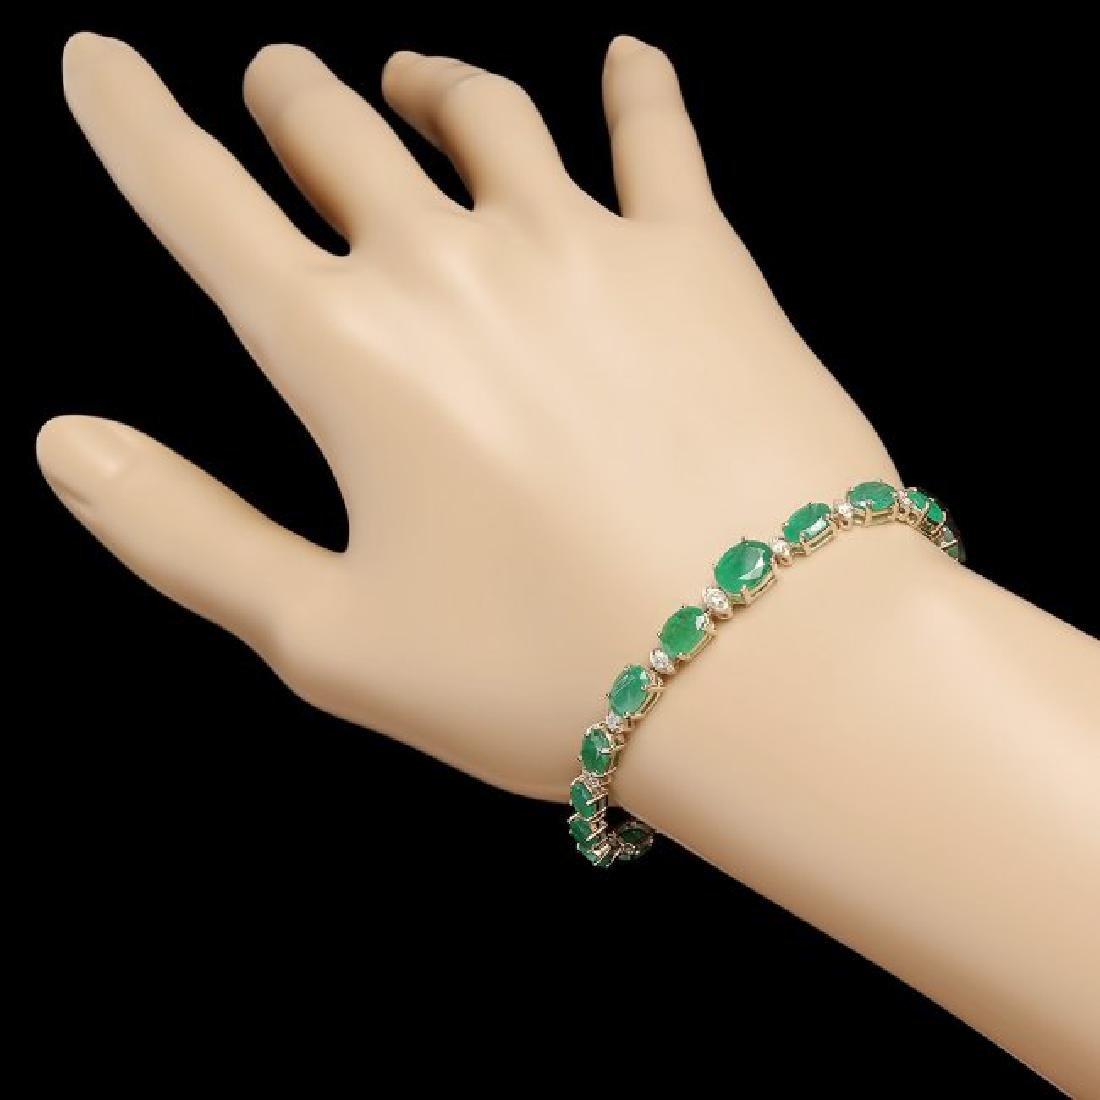 14k Gold 11.50ct Emerald 0.65ct Diamond Bracelet - 3